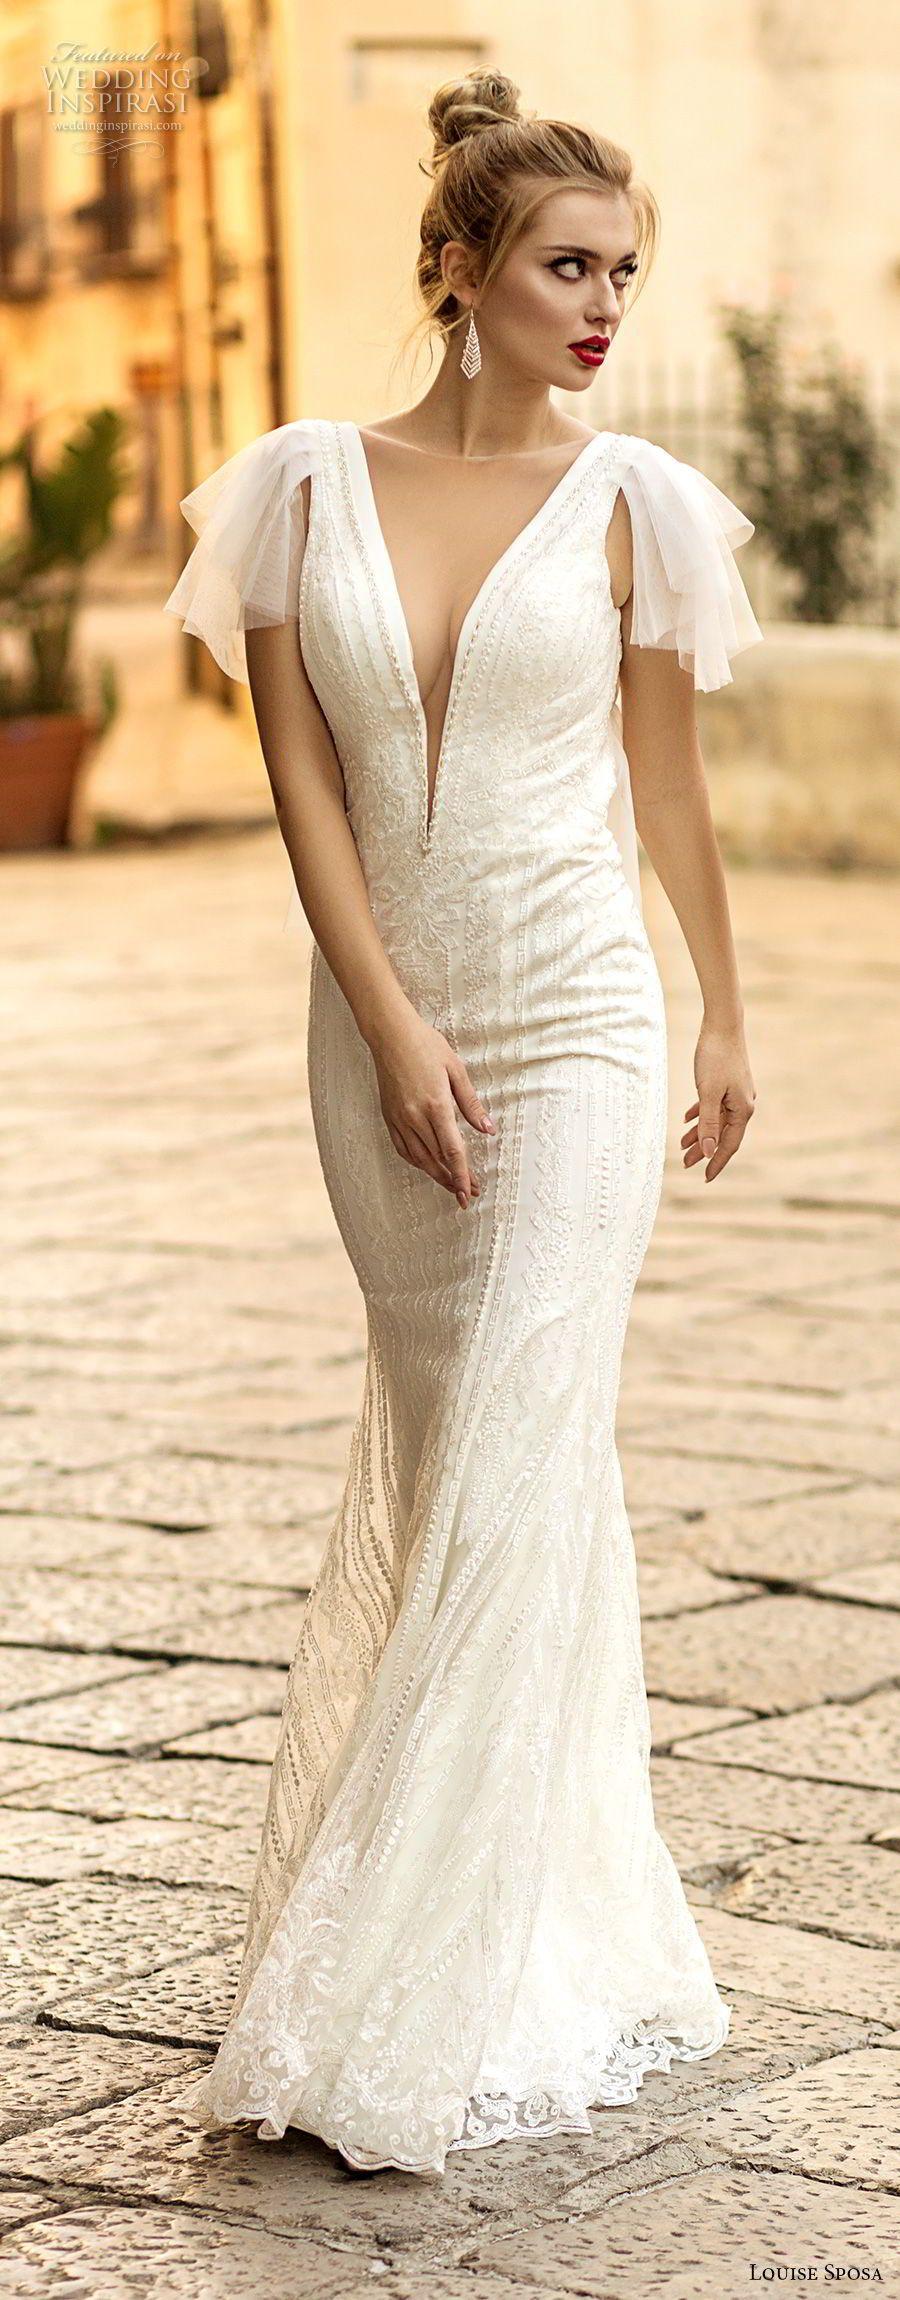 Louise Sposa 2018 Wedding Dresses Vestido casamento